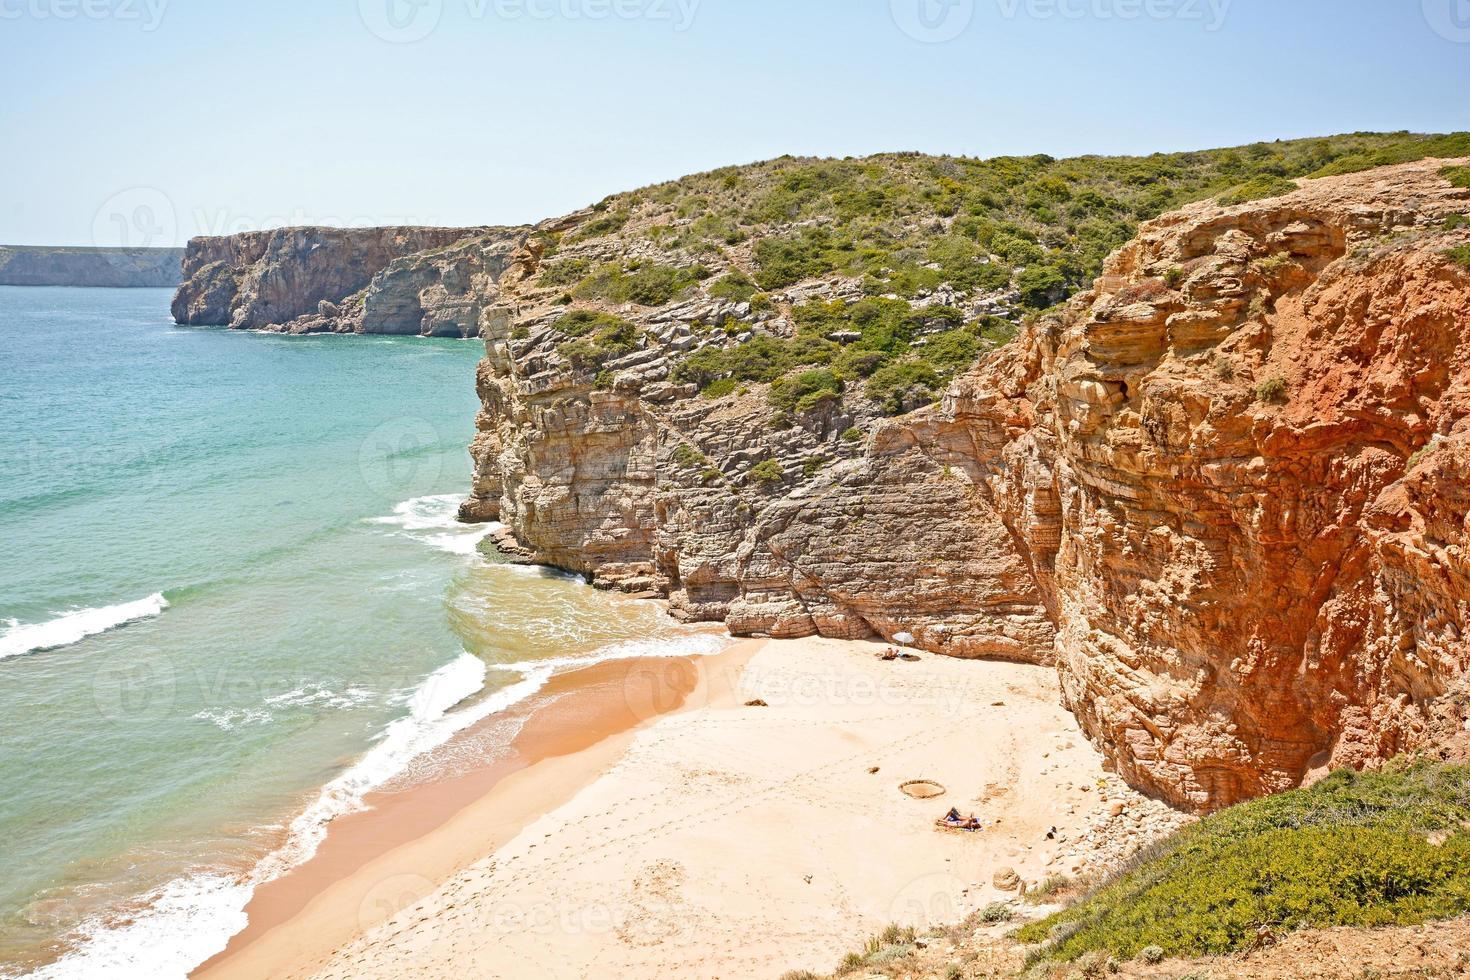 praia do beliche, praia perto de cabo são vicente, algarve portugal foto